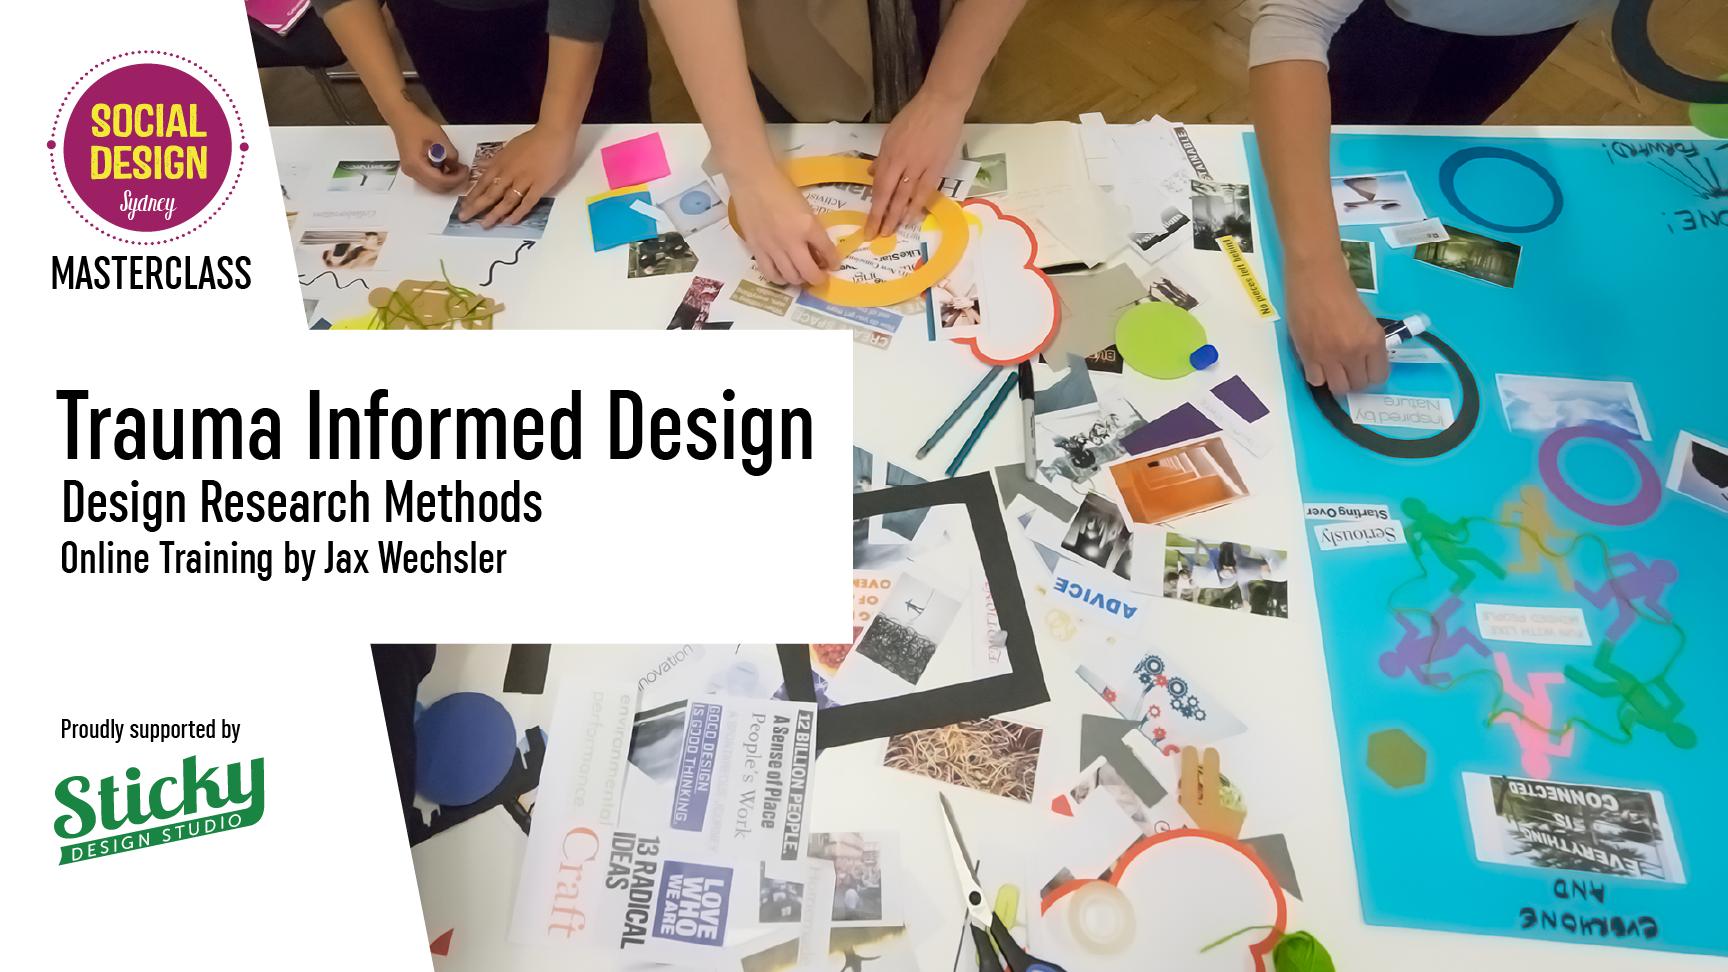 Trauma Informed Design Research Methods